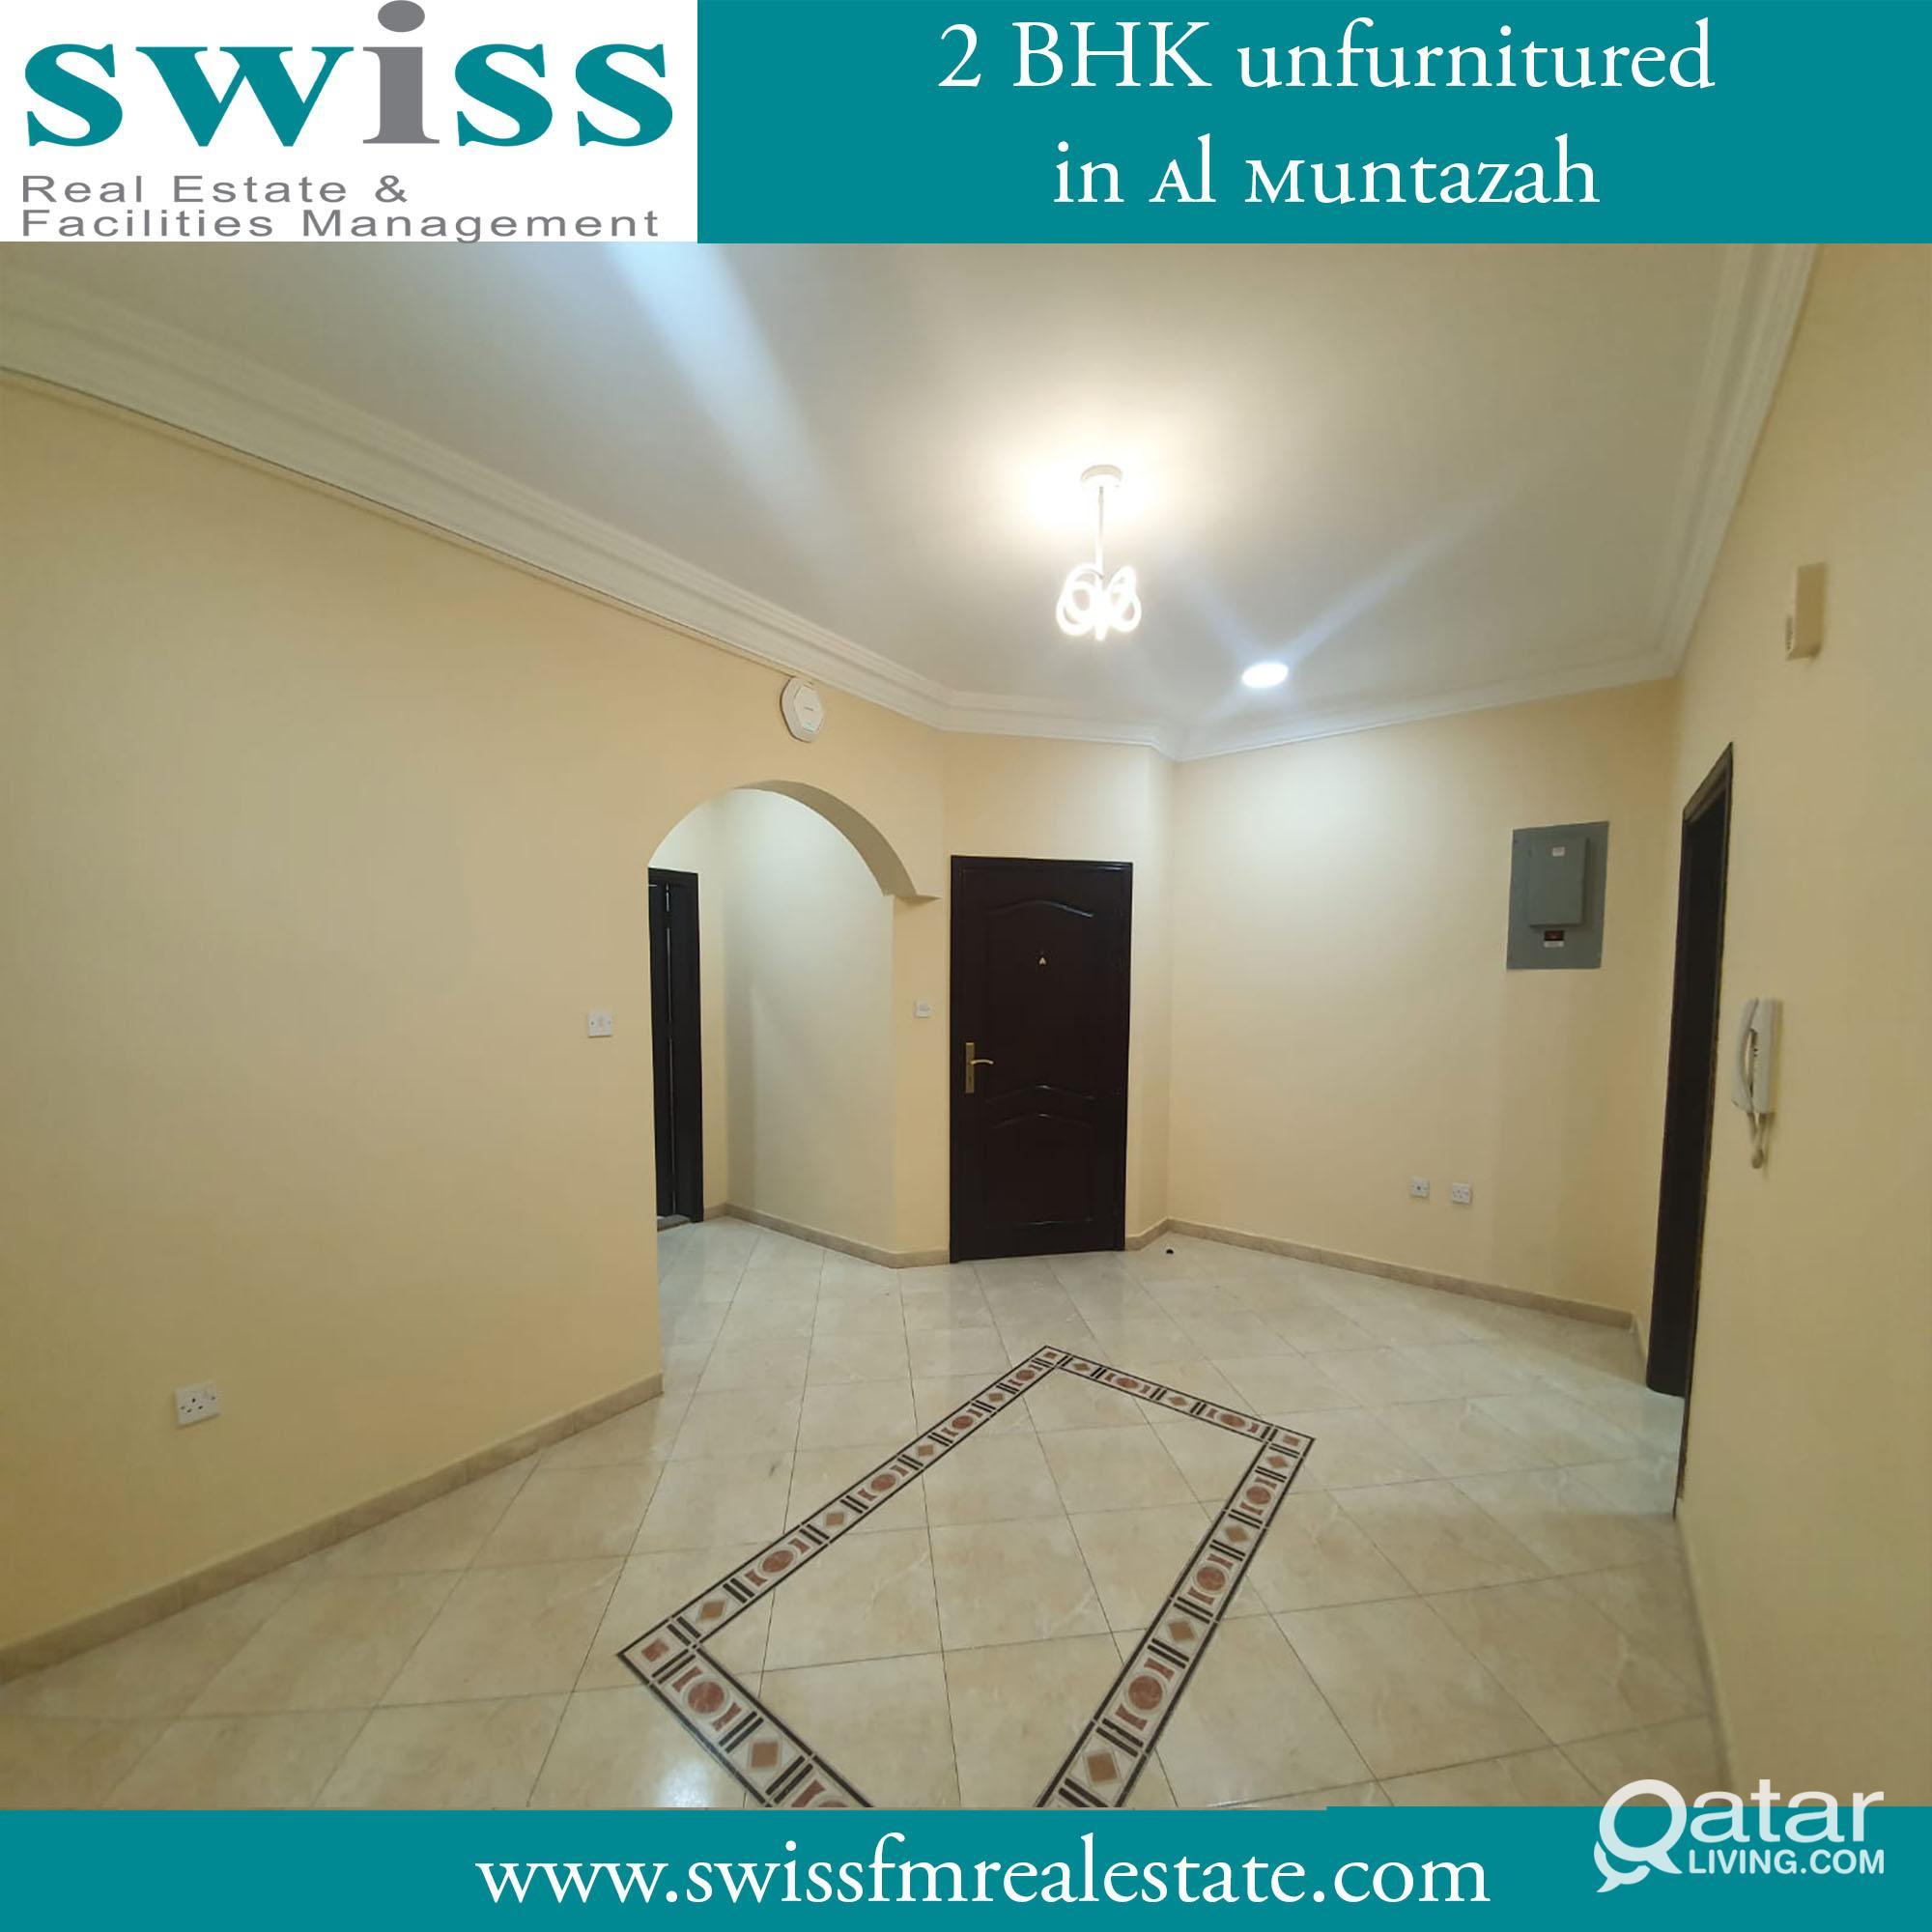 2 Bhk unfurnished in al muntazah for rent